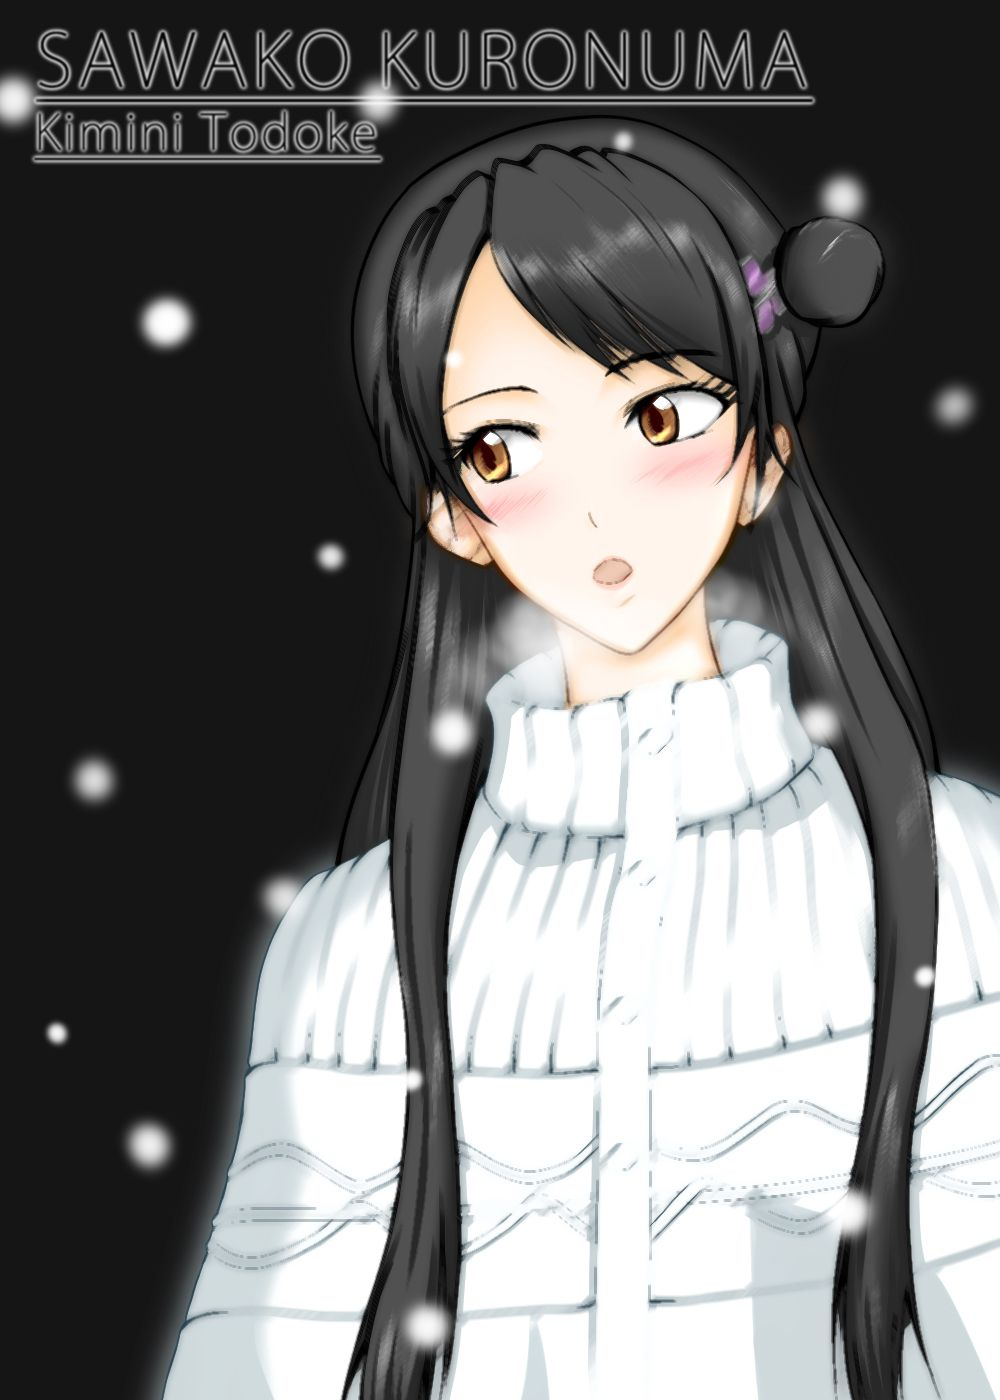 Sawako kiminitodoke Fan Art Anime Pinterest Kimi